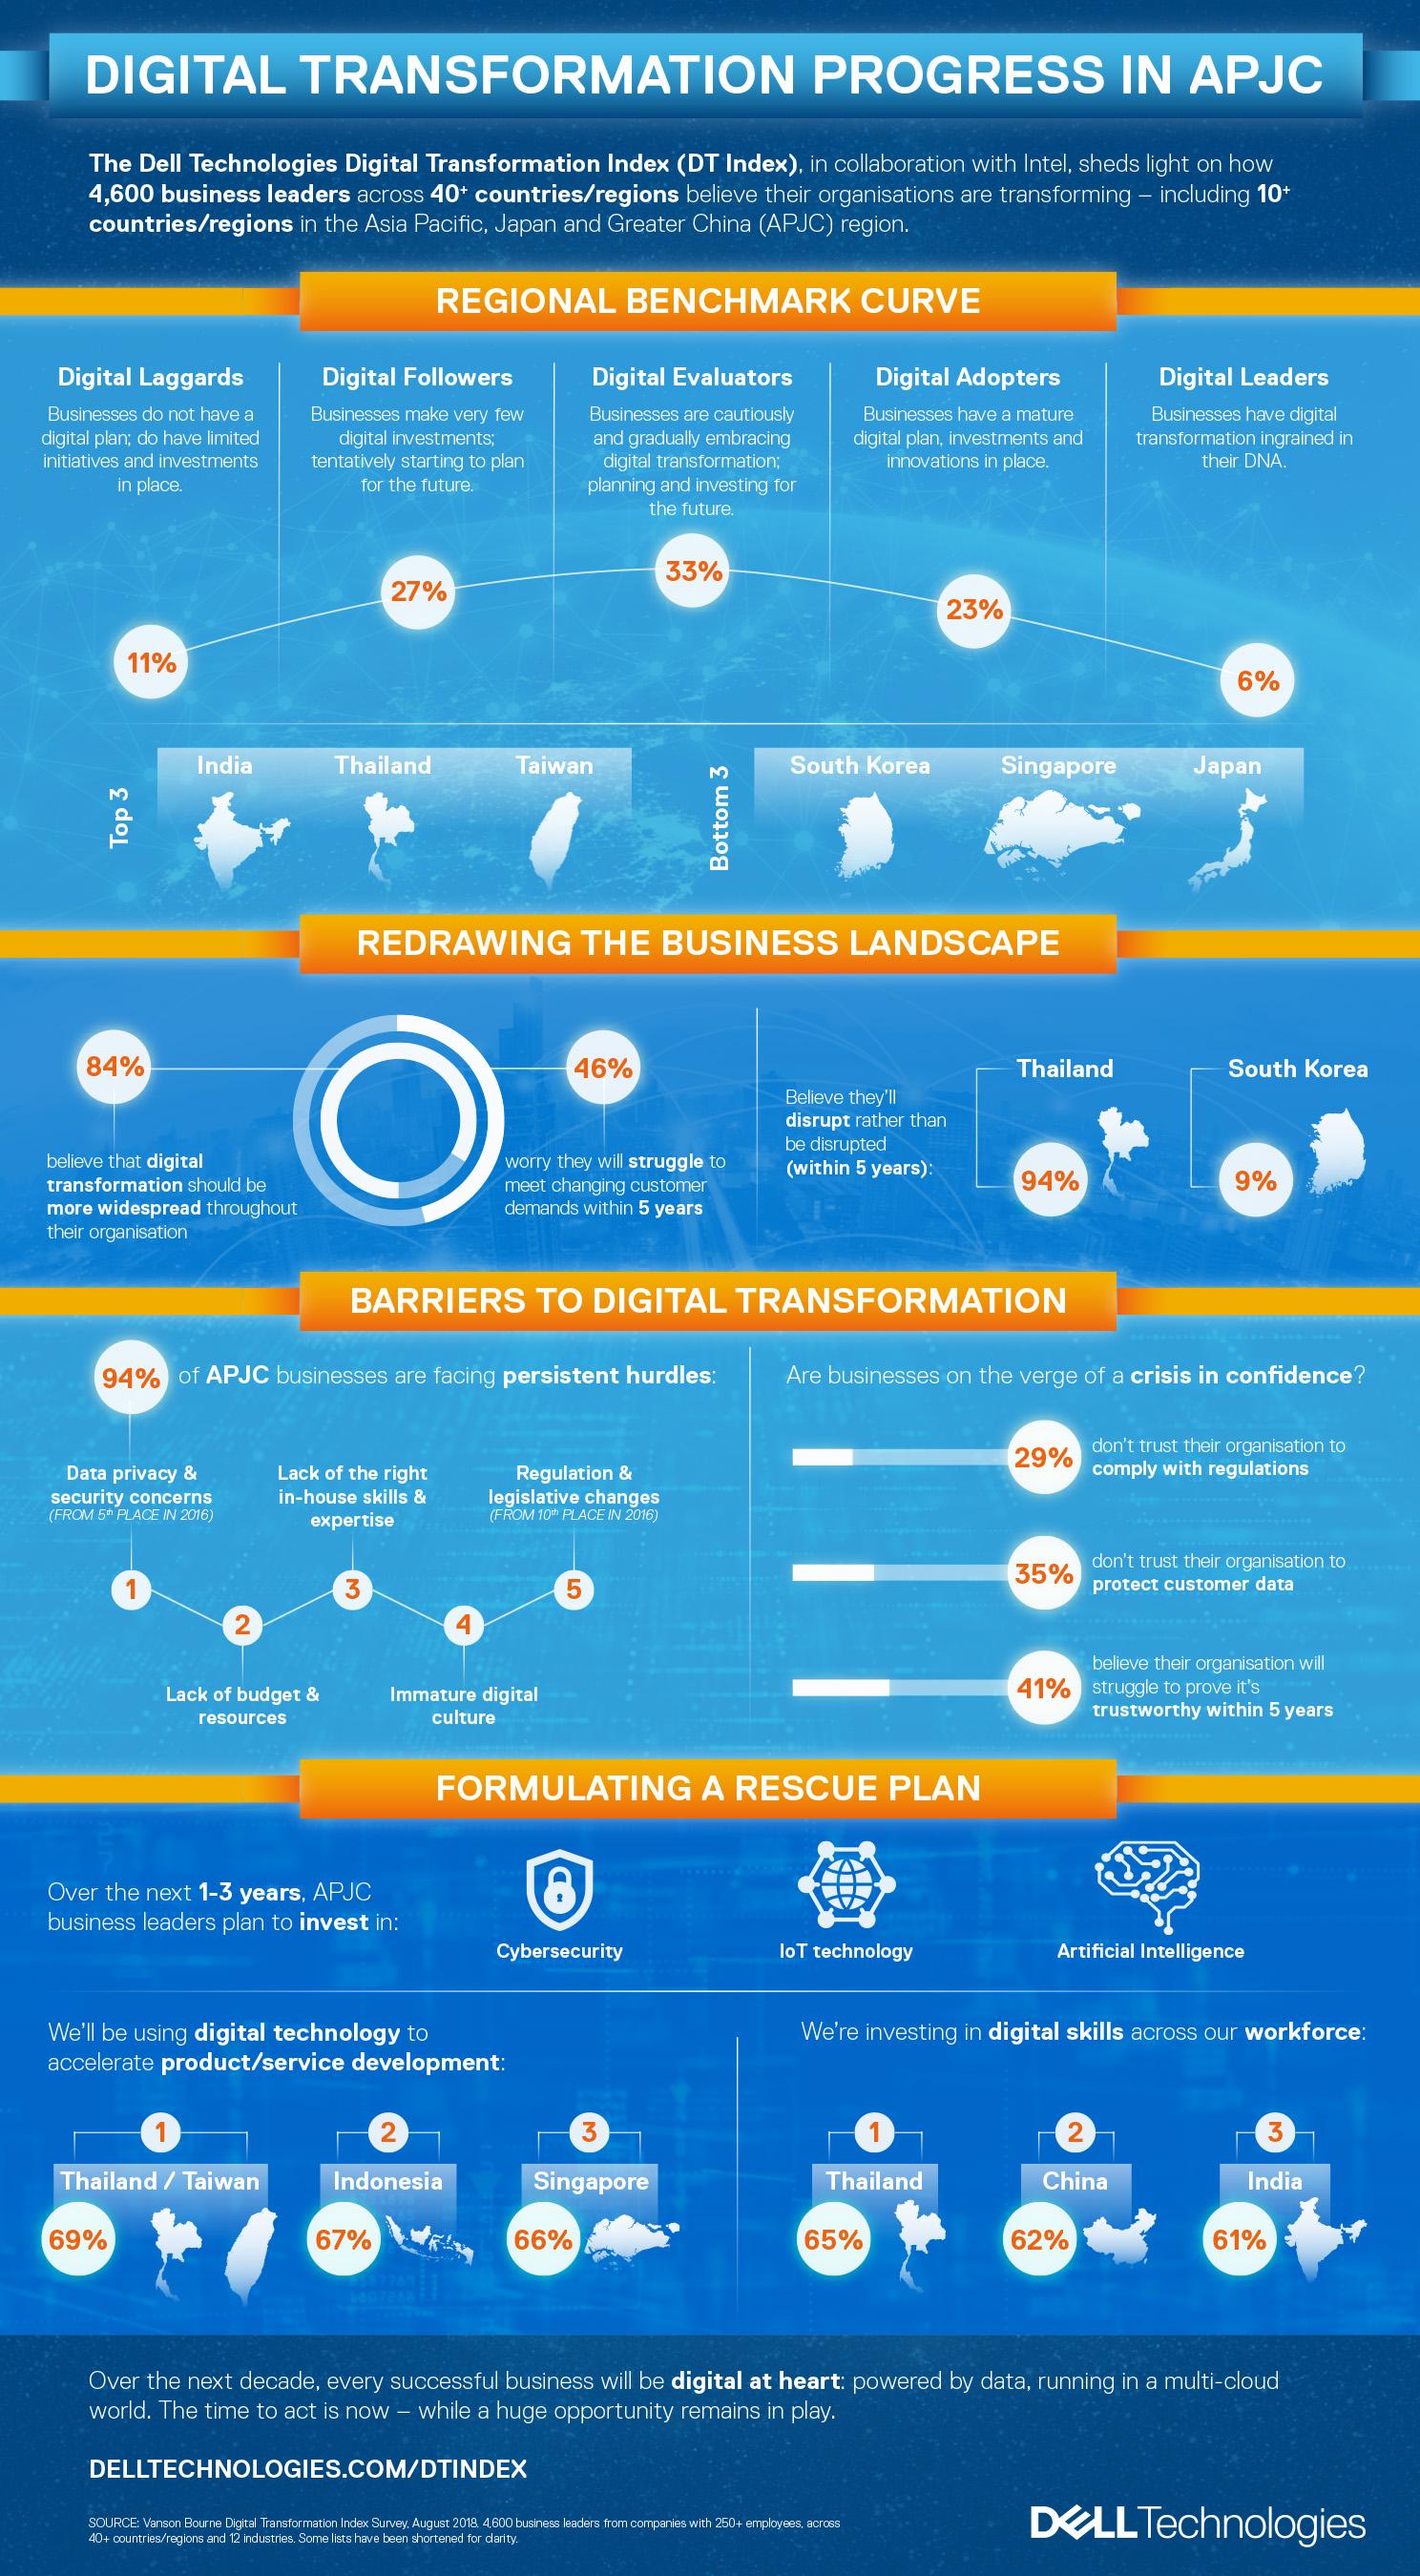 Digital transformation progress in APJC